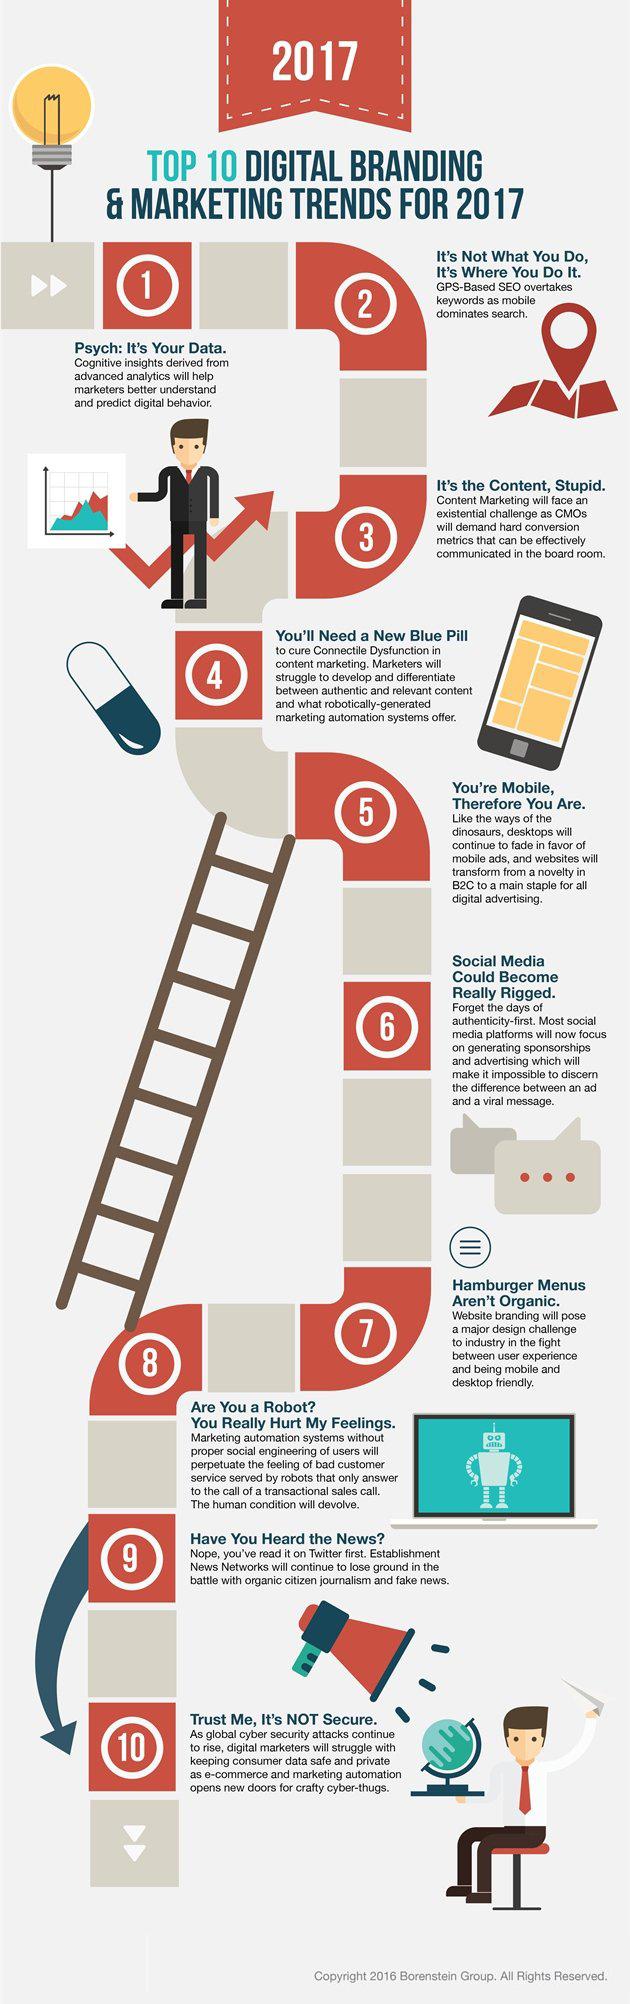 161221-infographic-Top-Digital-Marketing-Trends-2017-borenstein